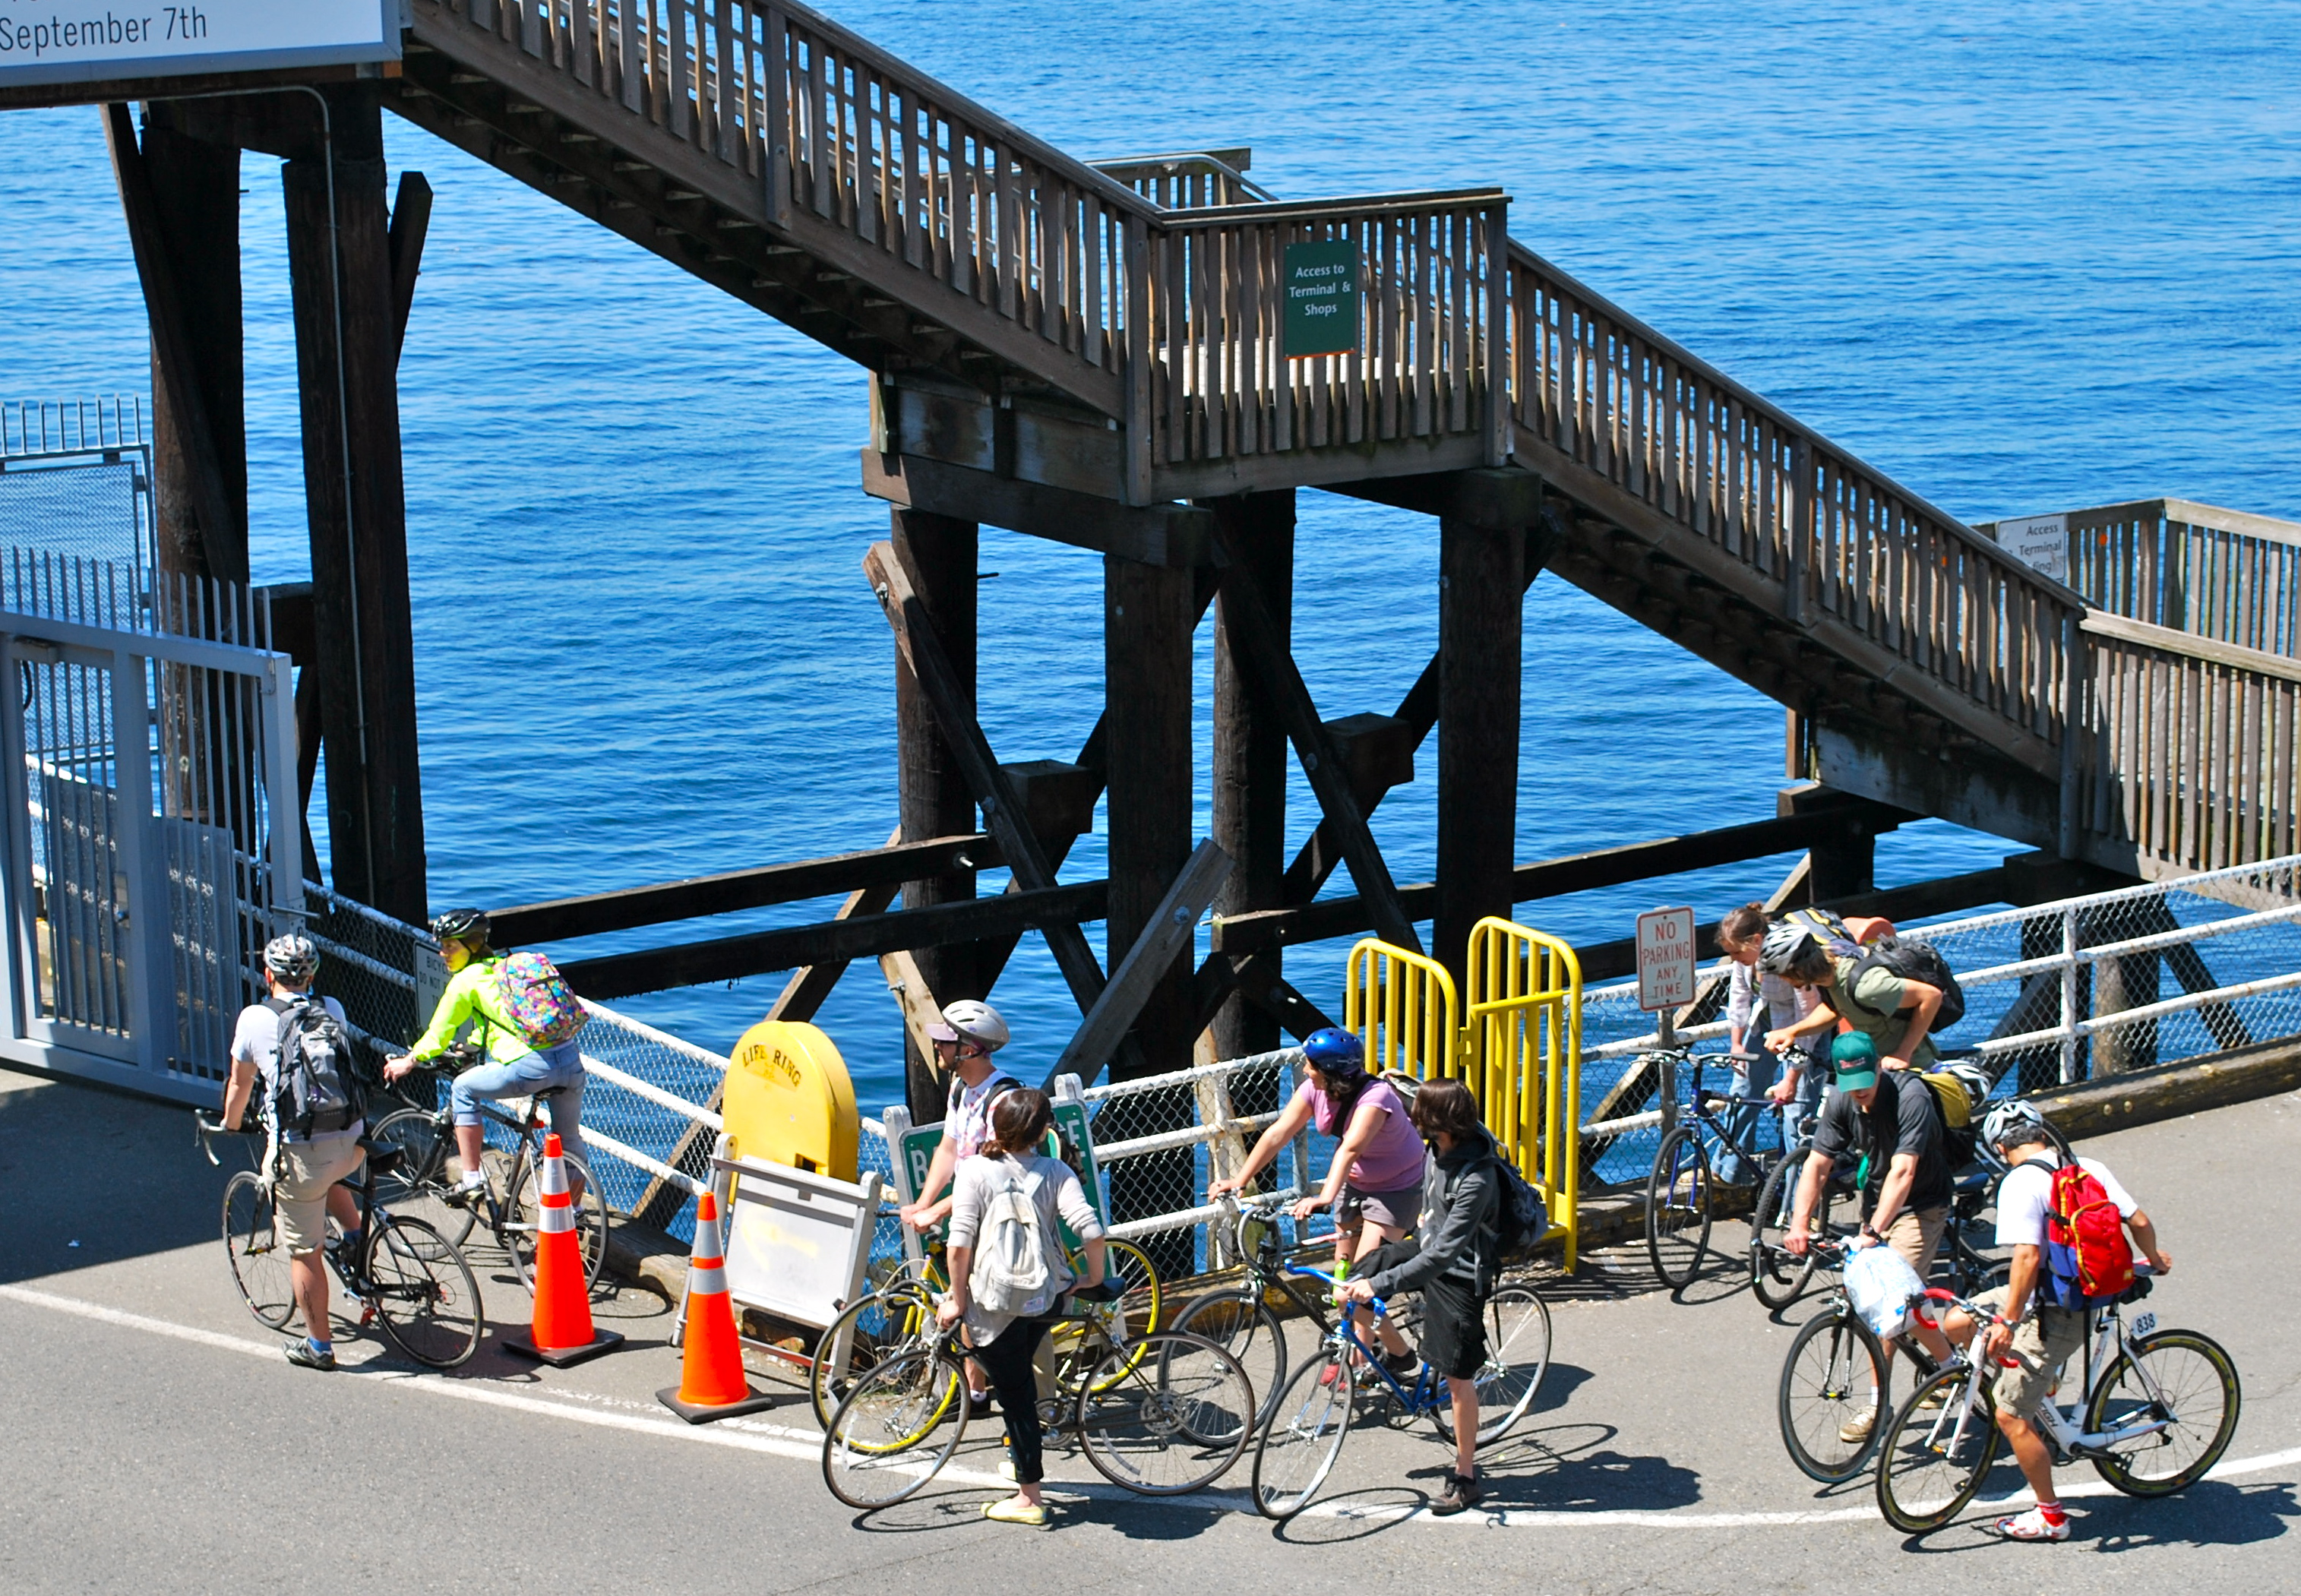 Cyclists getting on the Bainbridge Ferry, Seattle side in summer.